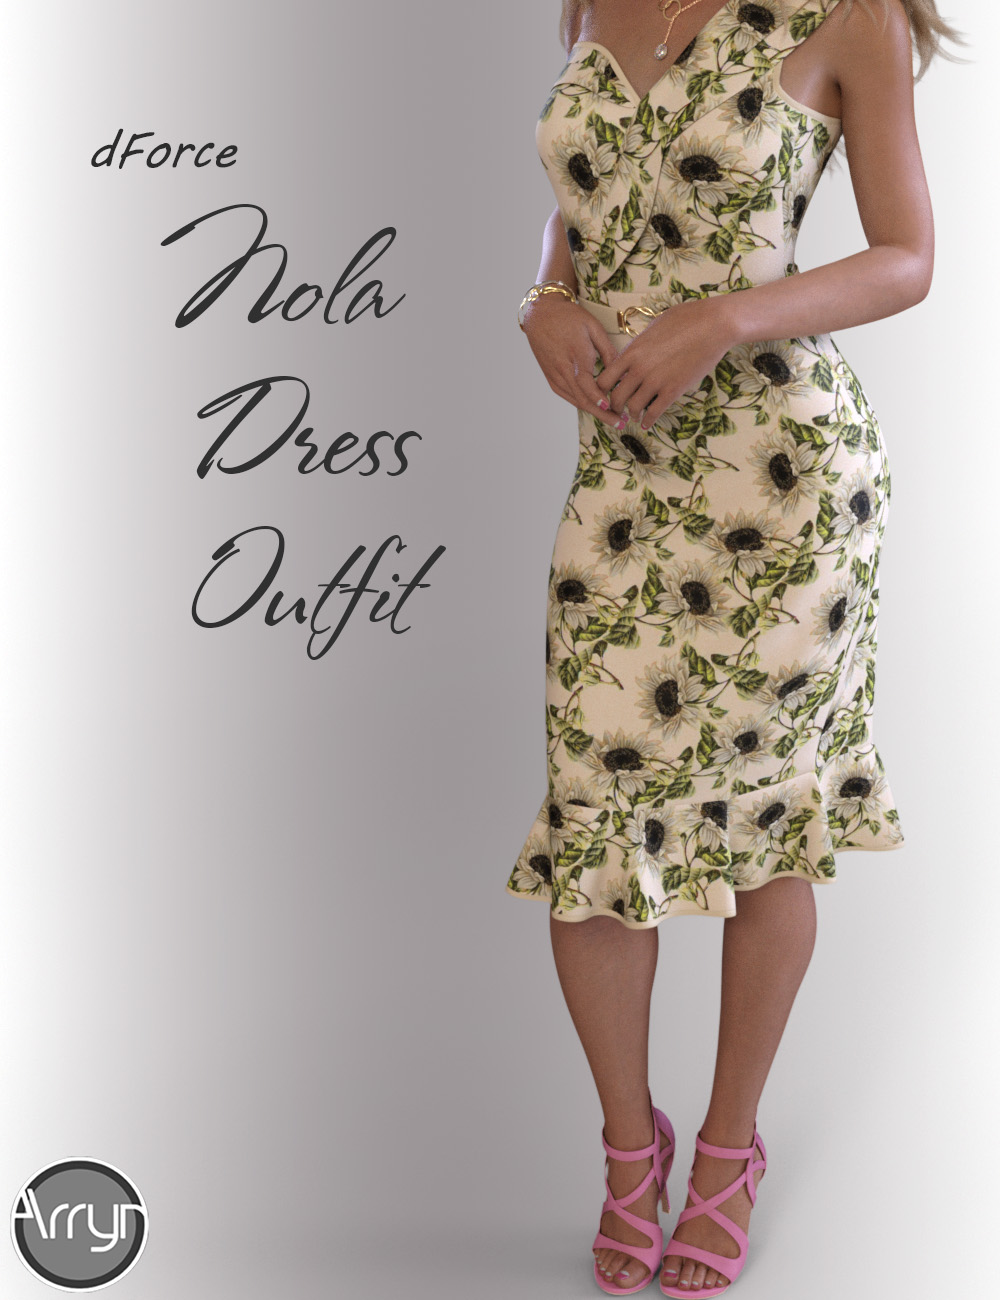 dForce Nola Cocktail Dress outfit for Genesis 8 Female(s) by: OnnelArryn, 3D Models by Daz 3D